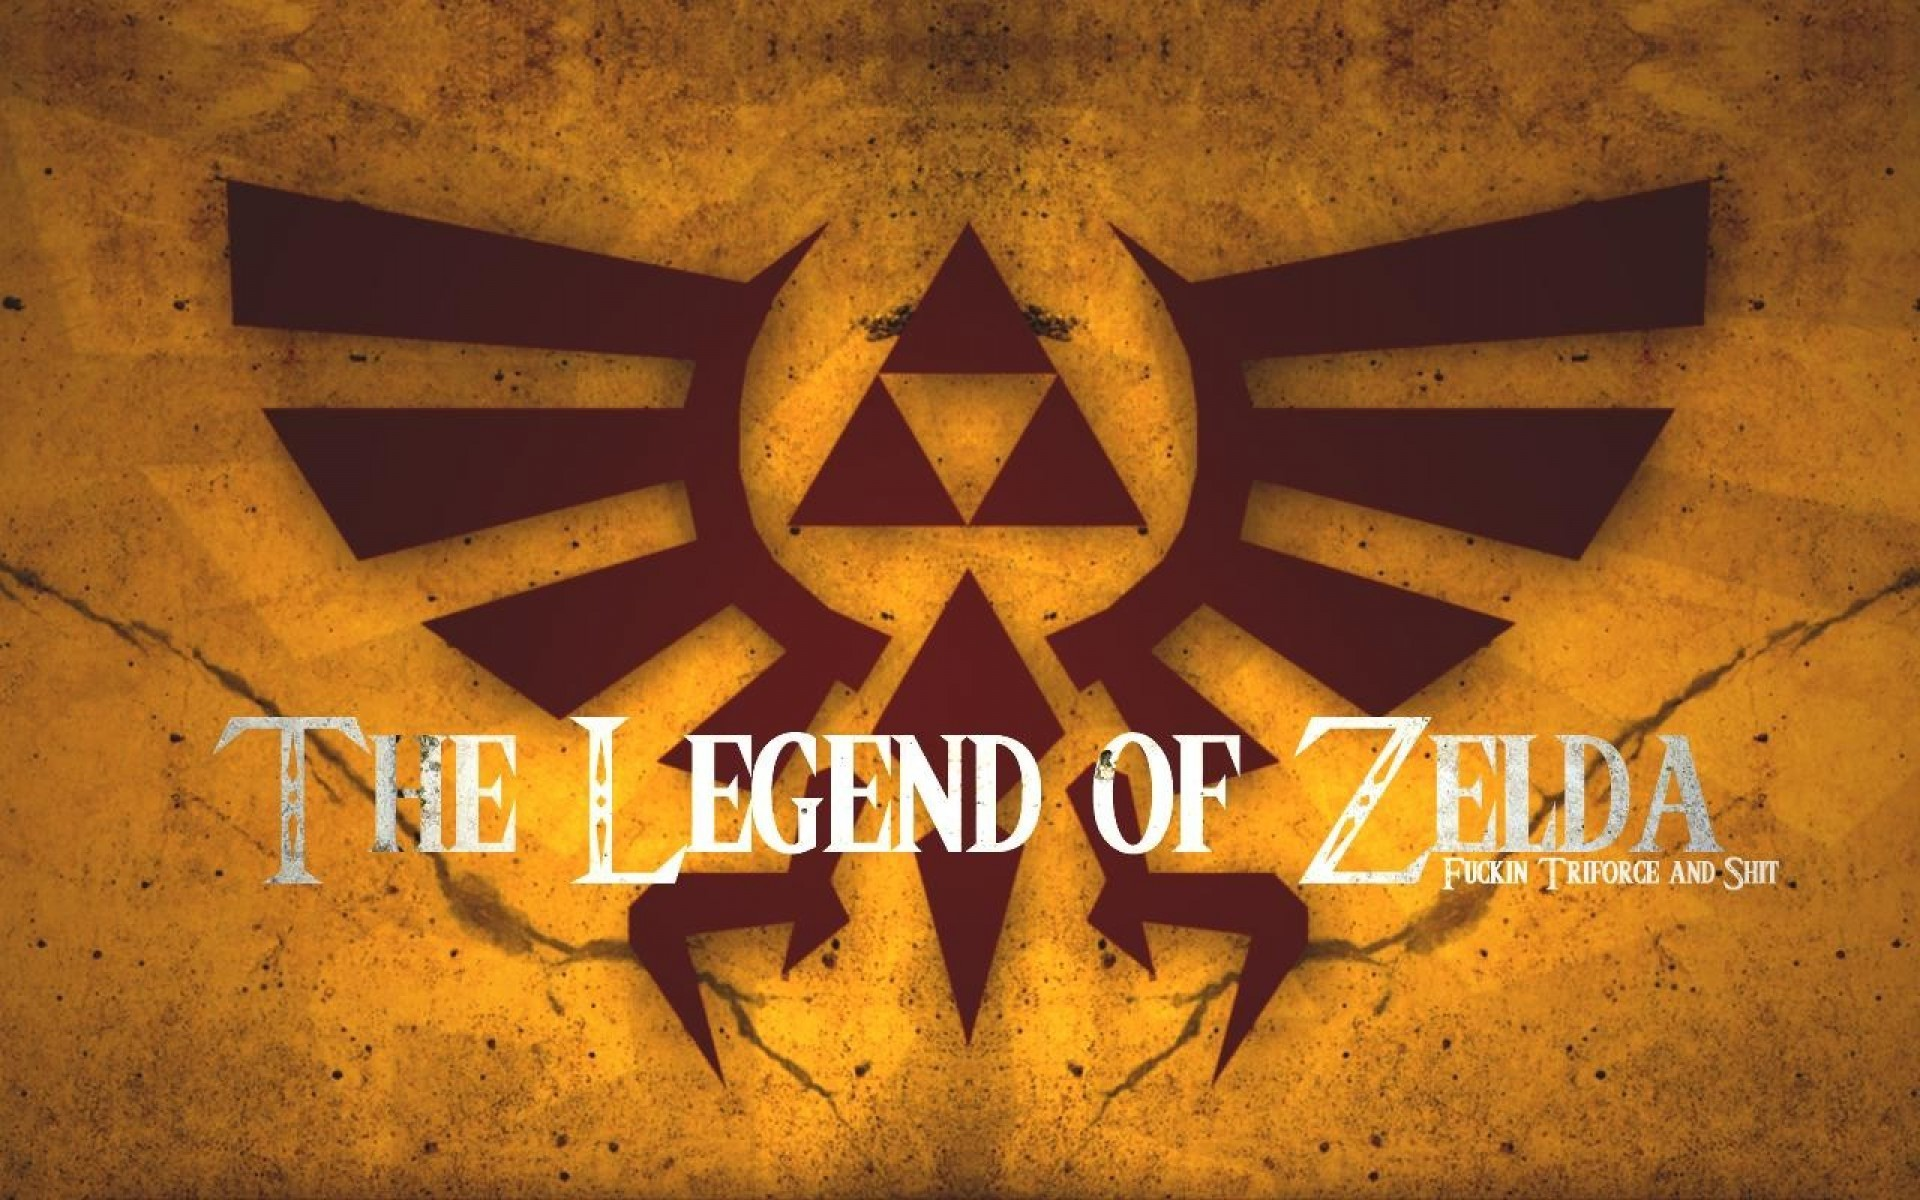 Legend Of Zelda Triforce Wallpaper Hd wallpaper